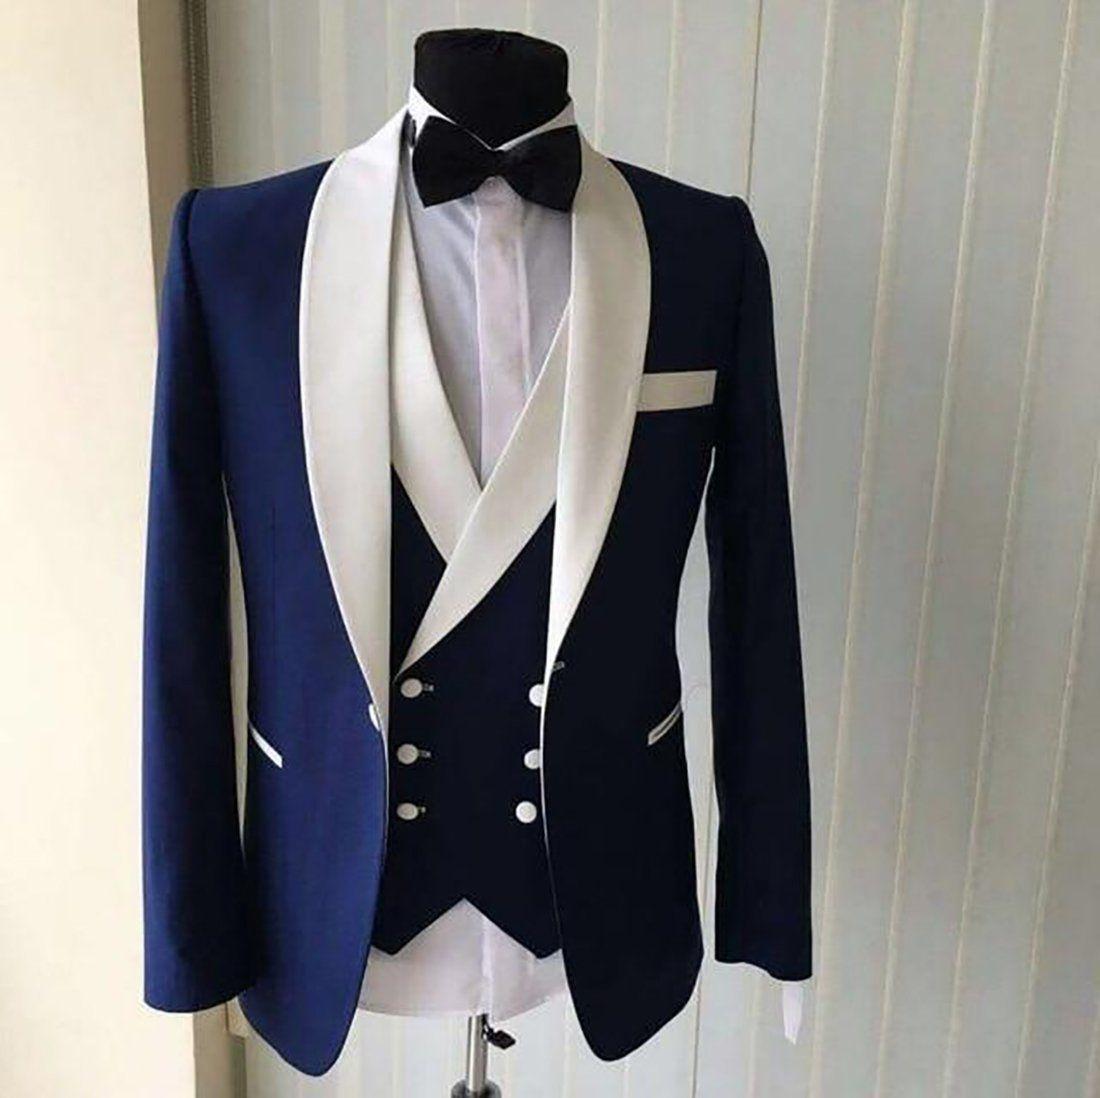 2018 White Burgundy Lapel Men Wedding Suit Slim Fit 3Pcs Tuxedo Groomsman Custom